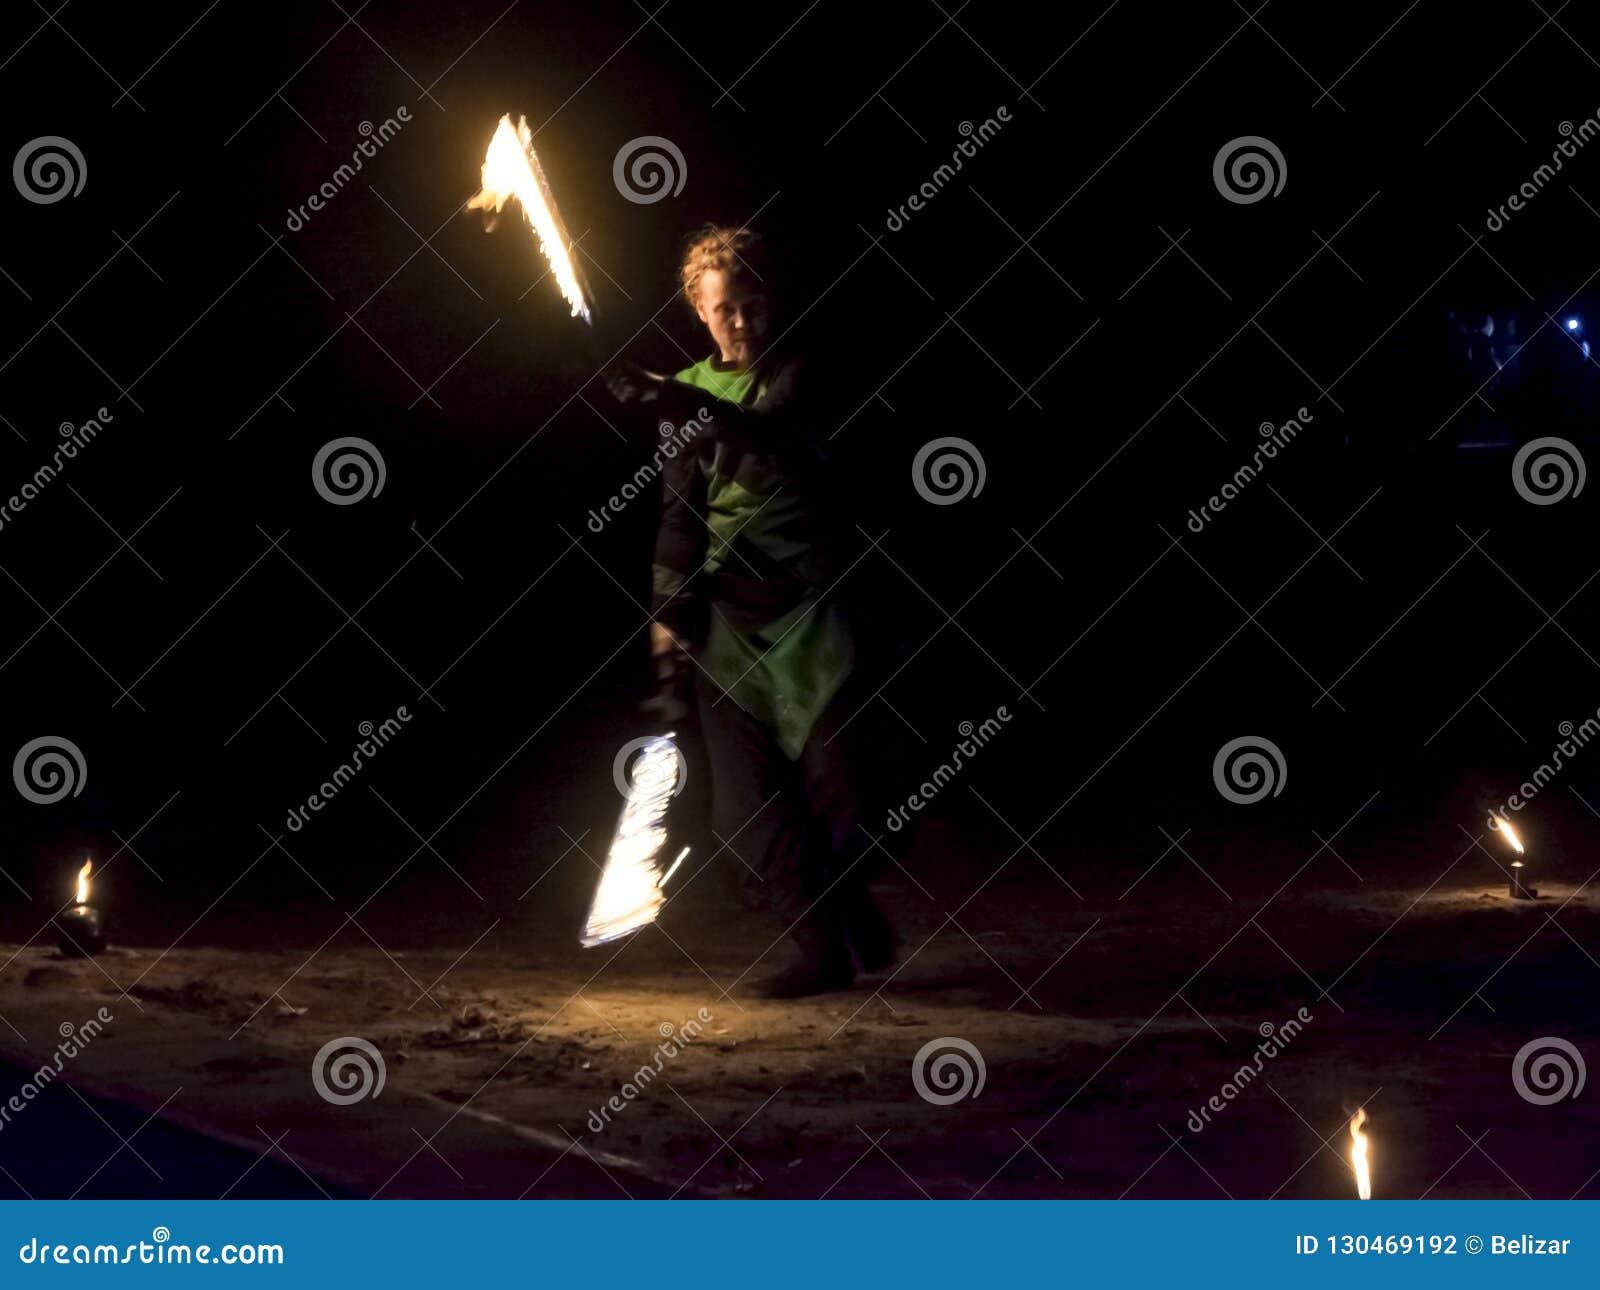 Feuer juggers in der Dunkelheit